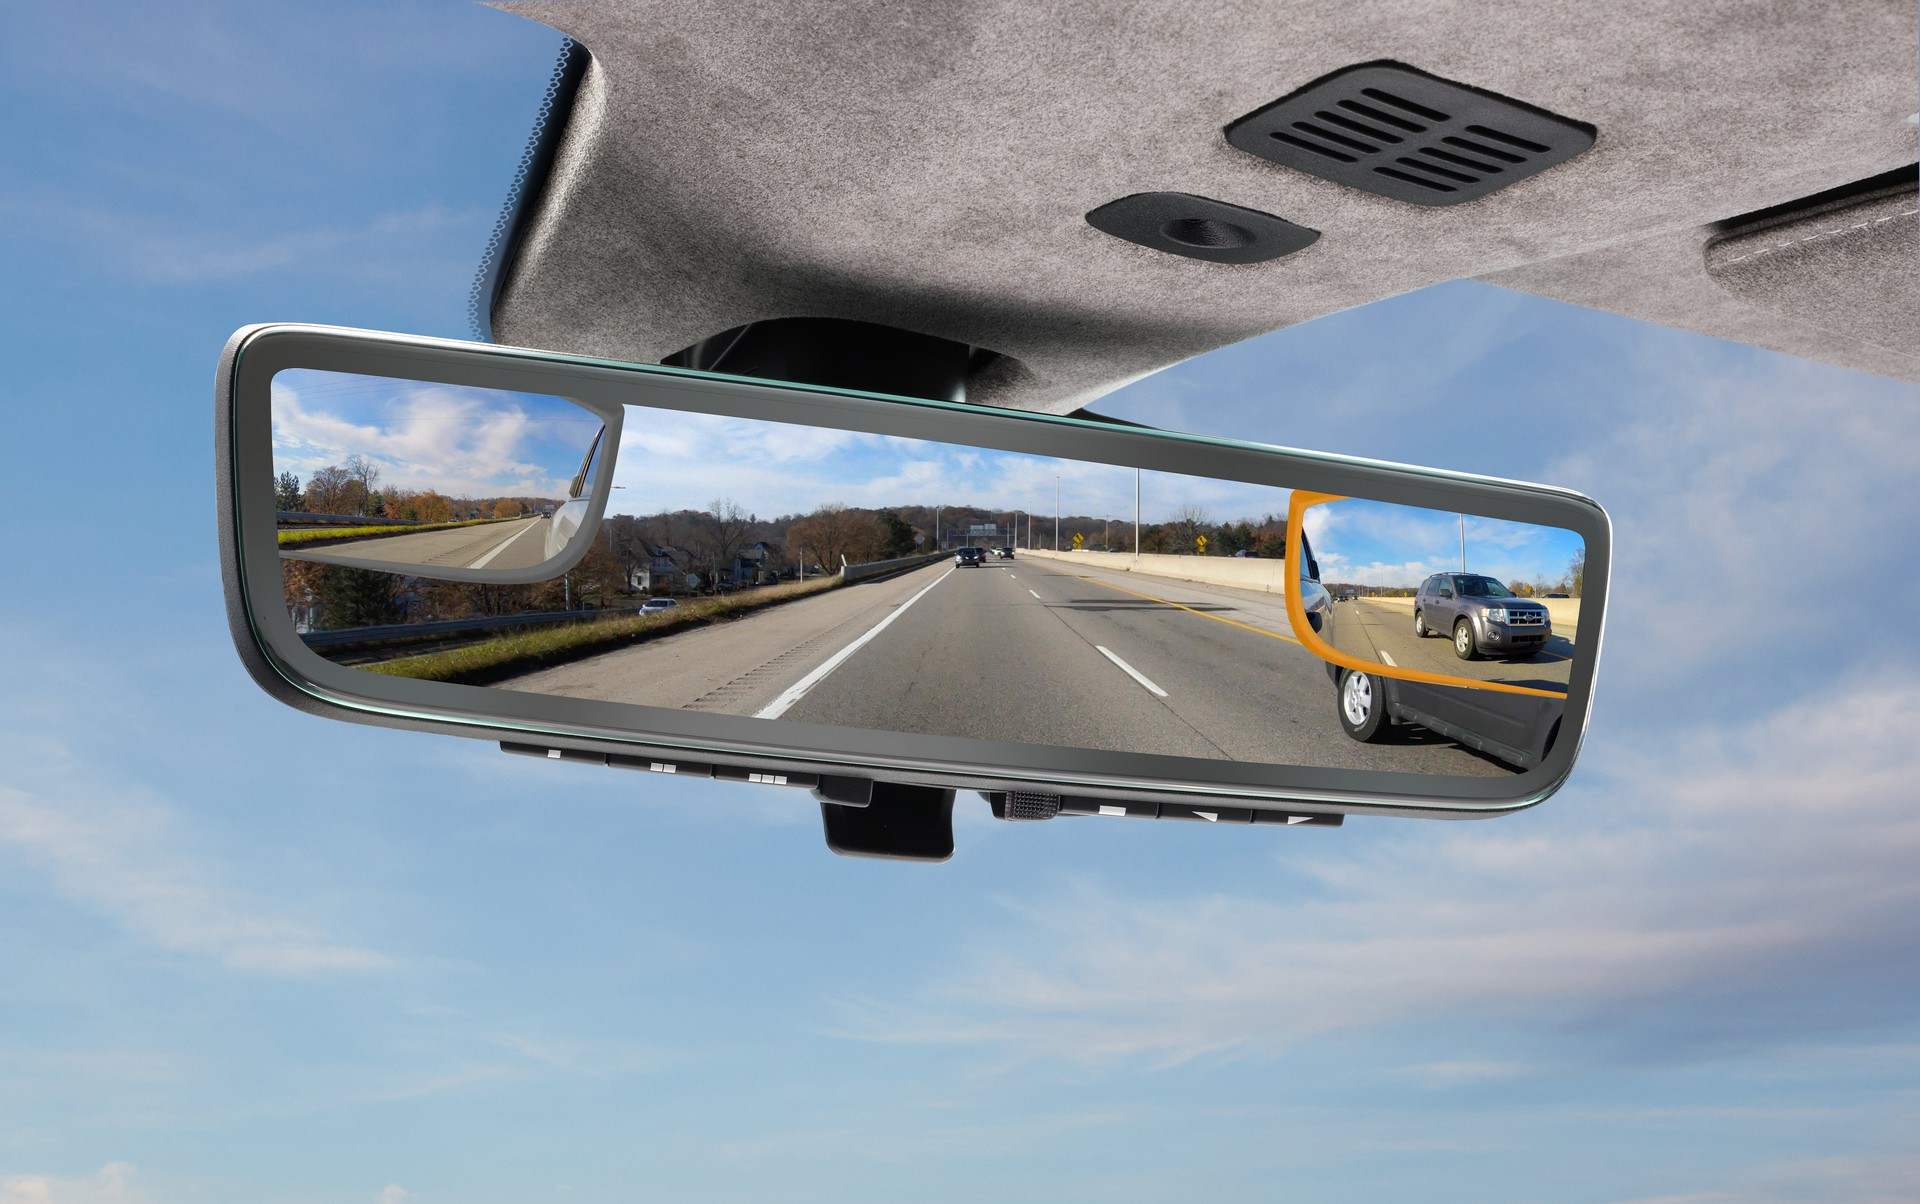 Aston-Martin-tri-camera-rearview-mirror-system-5